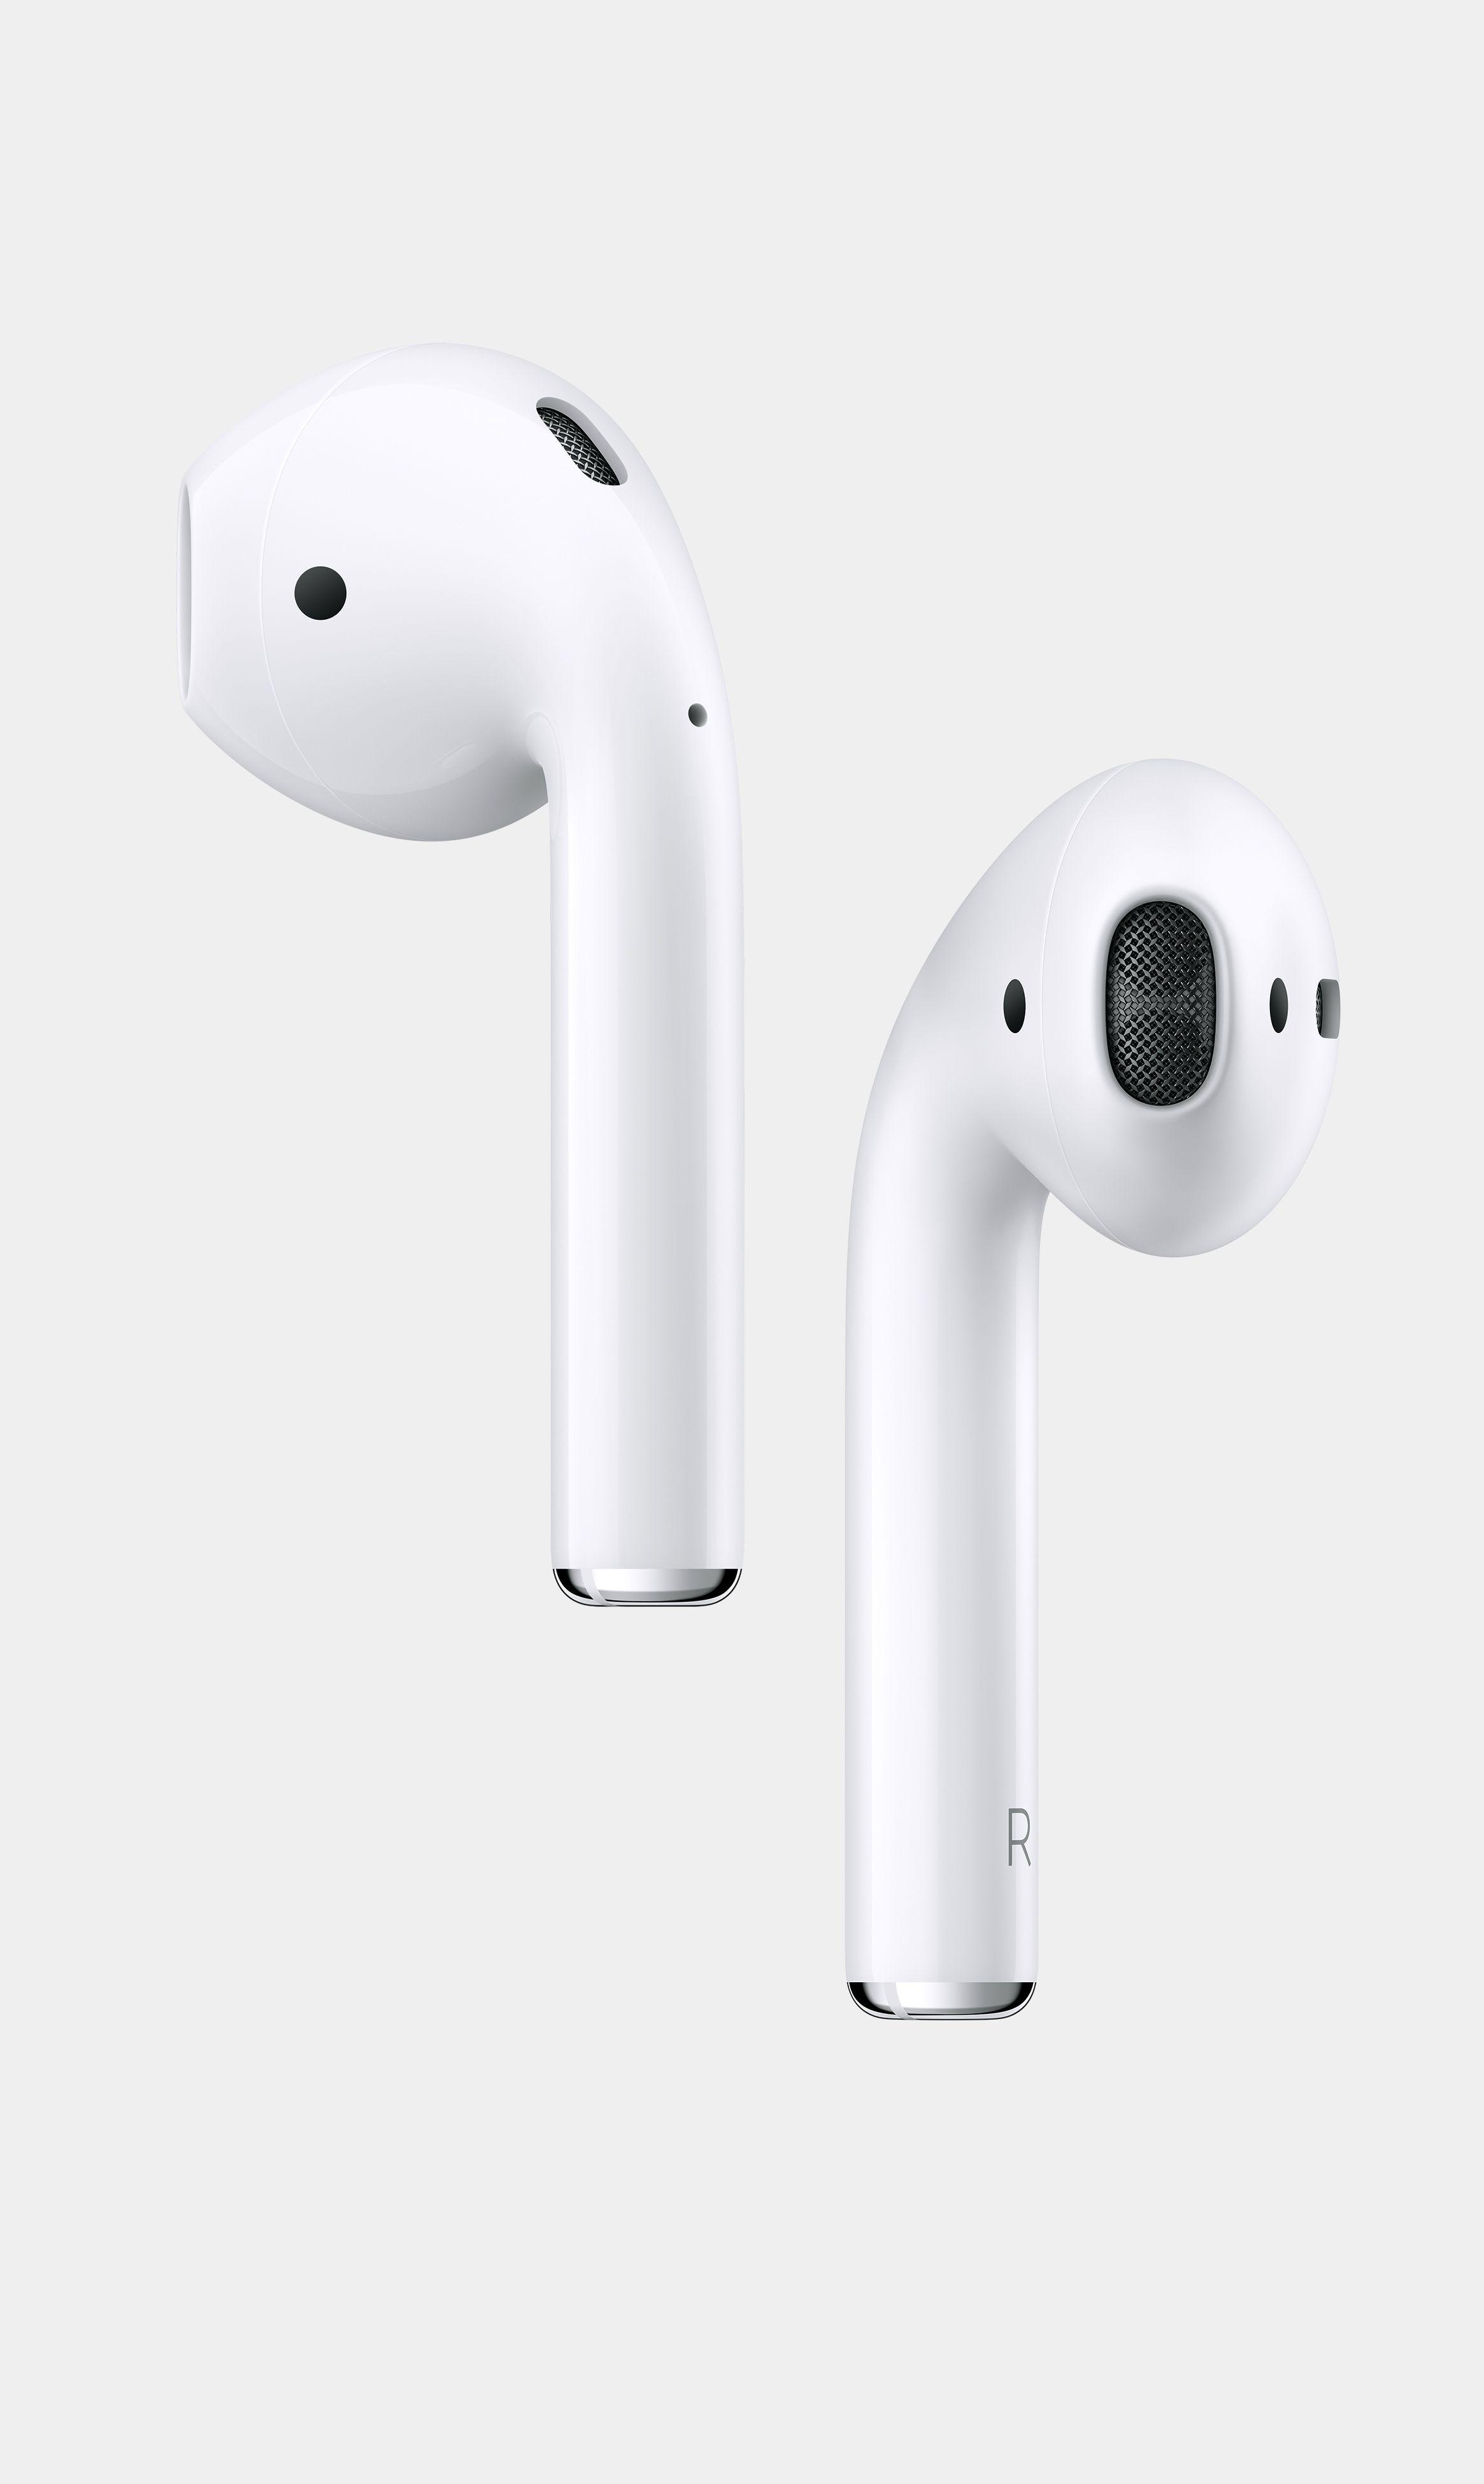 Apple Airpods Tech Gift Gifts Tech Gifts Tech Gift Gifts Techgifts Www Thinkruptor Com Wireless Headphones Apple Technology Apple Accessories